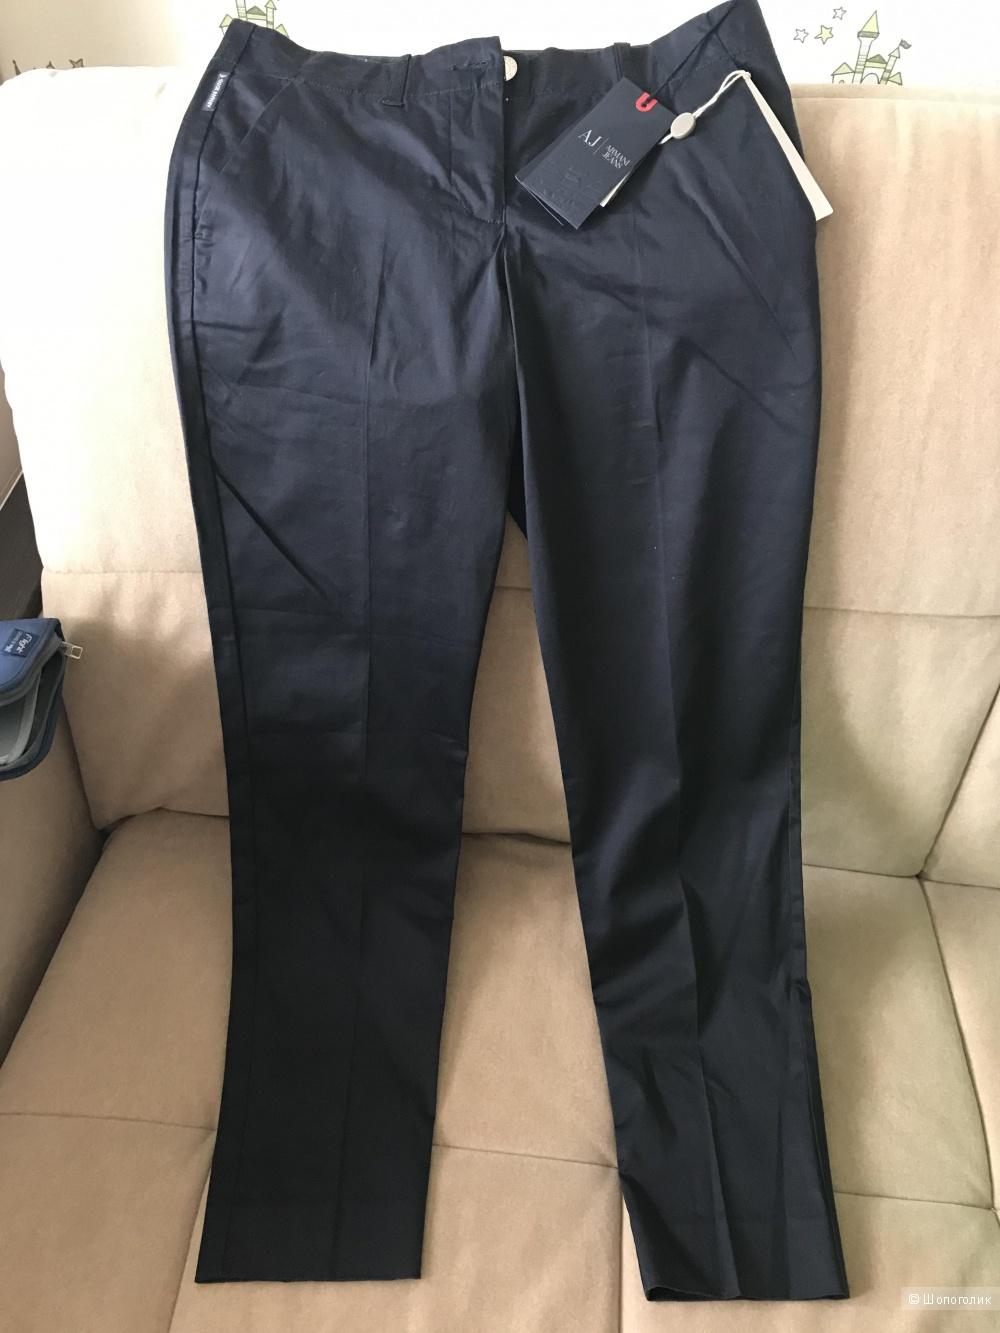 Брюки новые, Armani jeans 44 размер